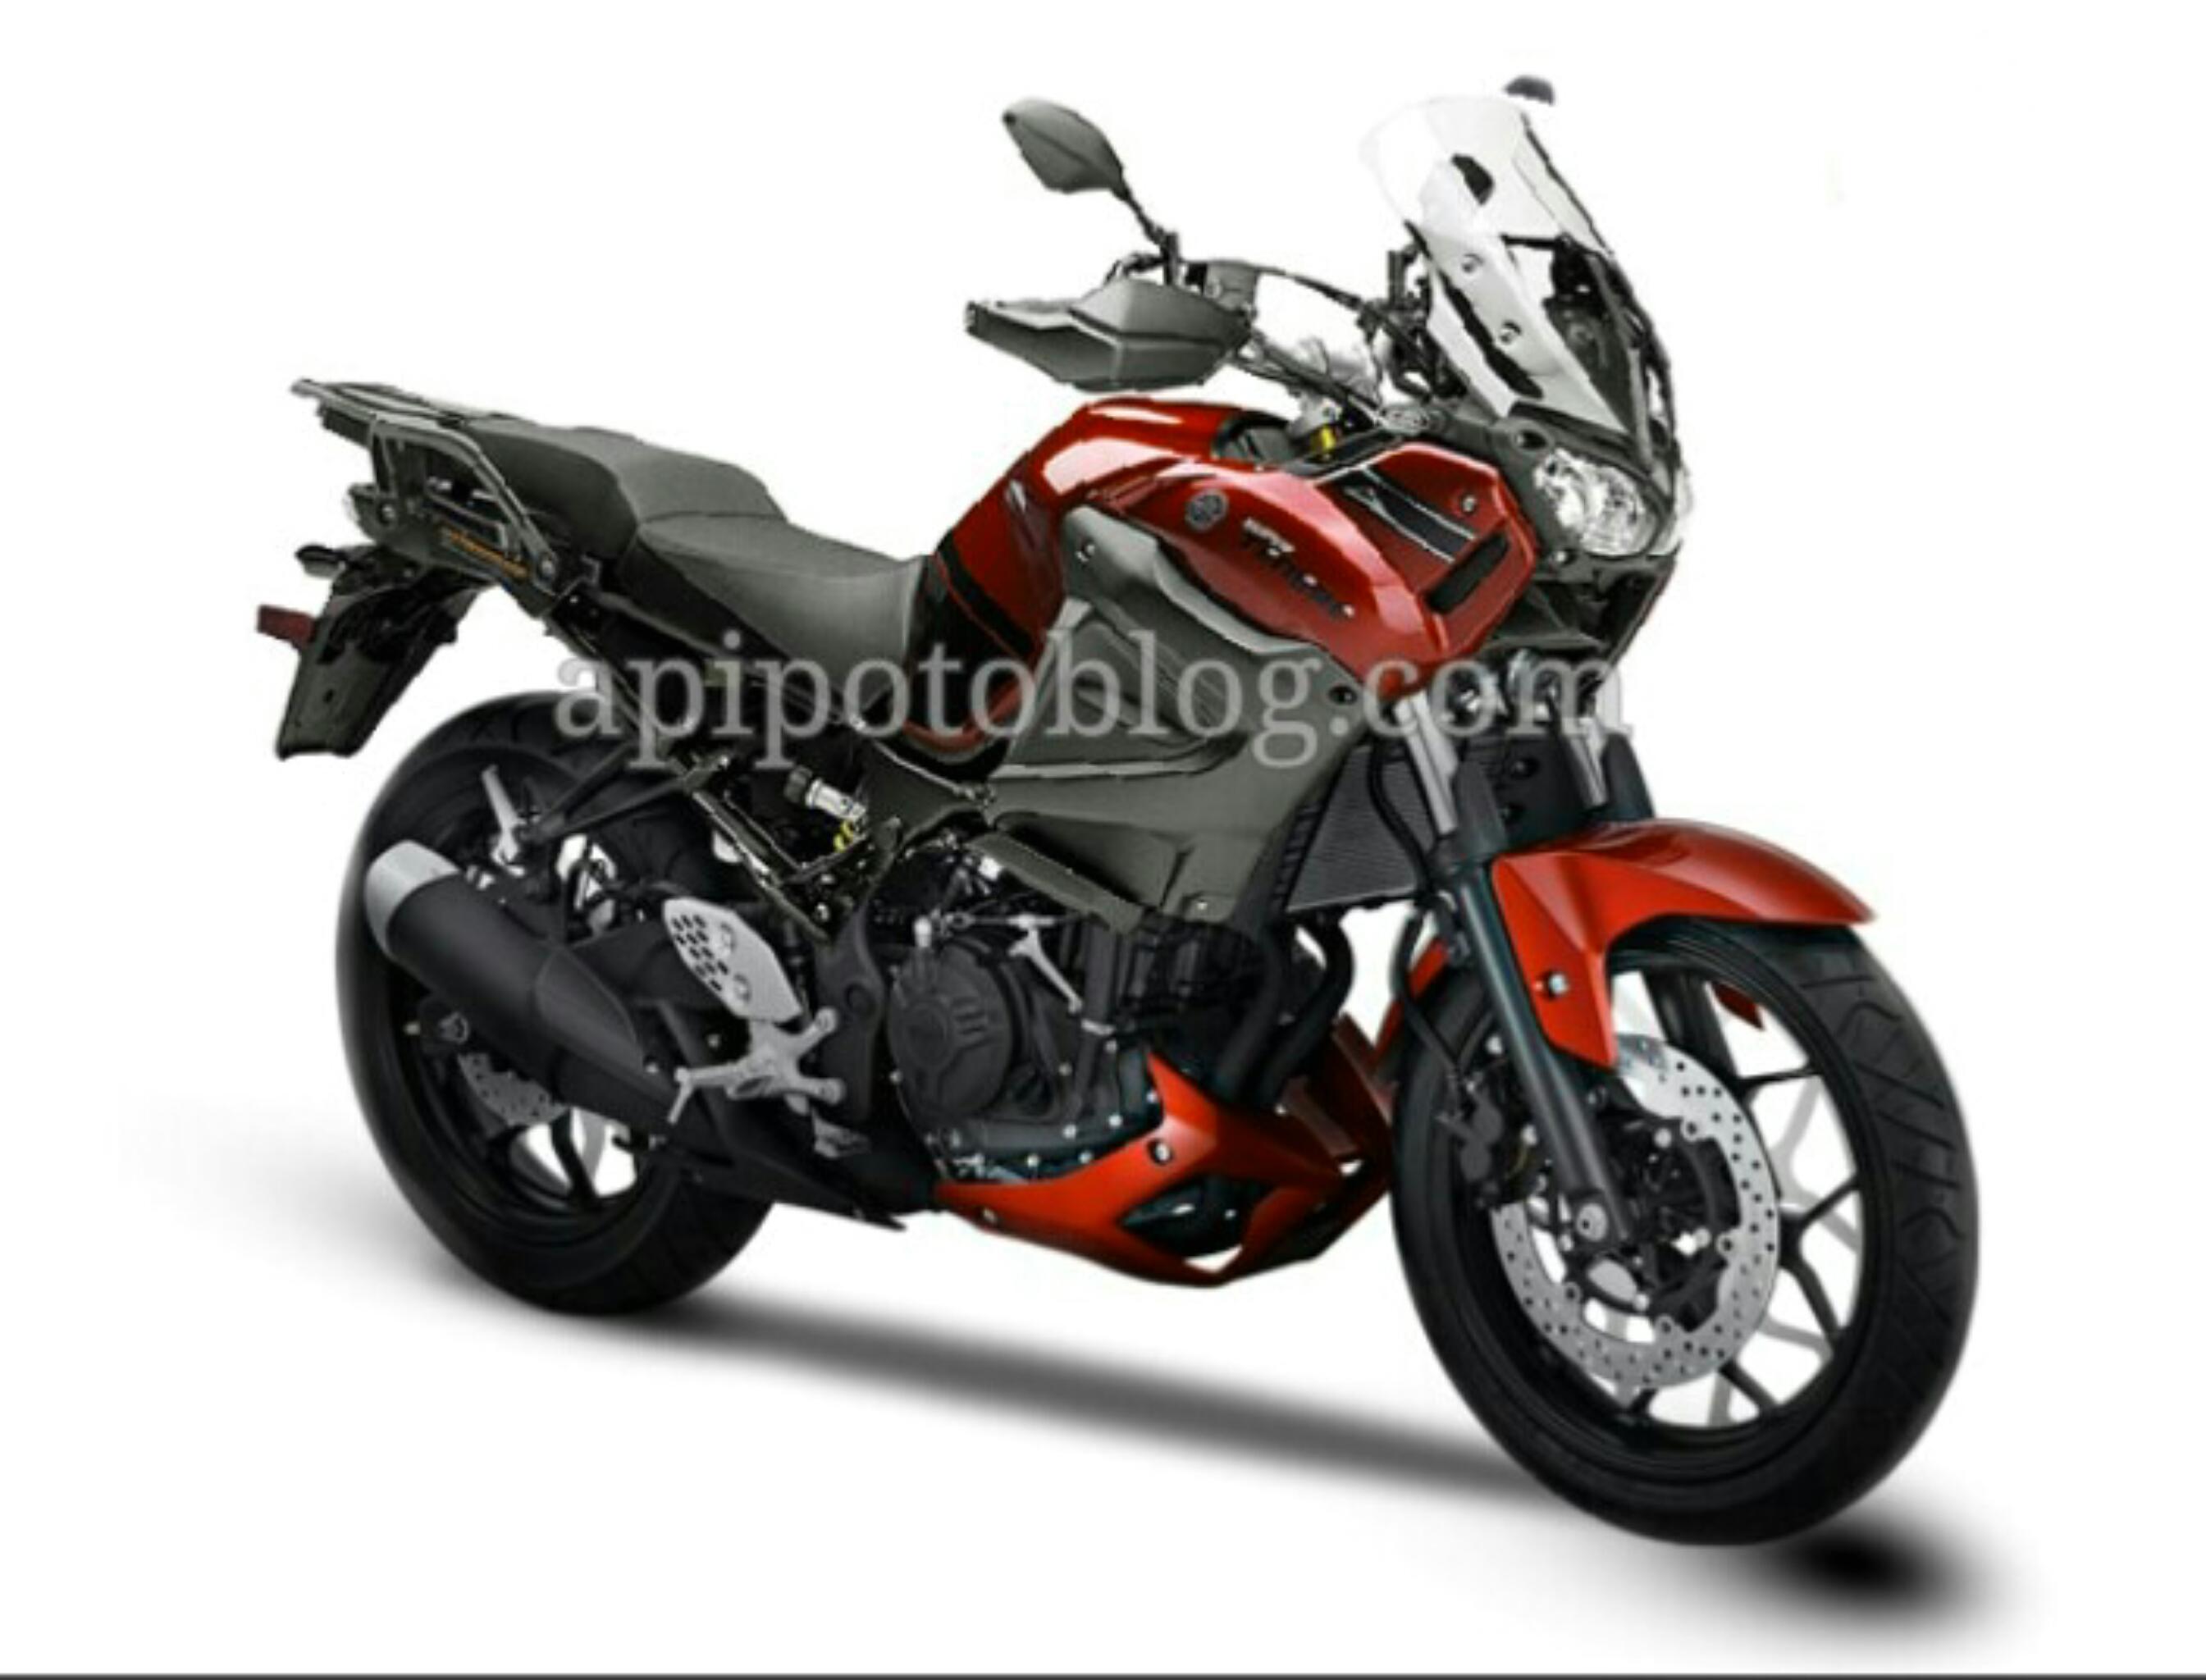 Harga Kawasaki Ktm